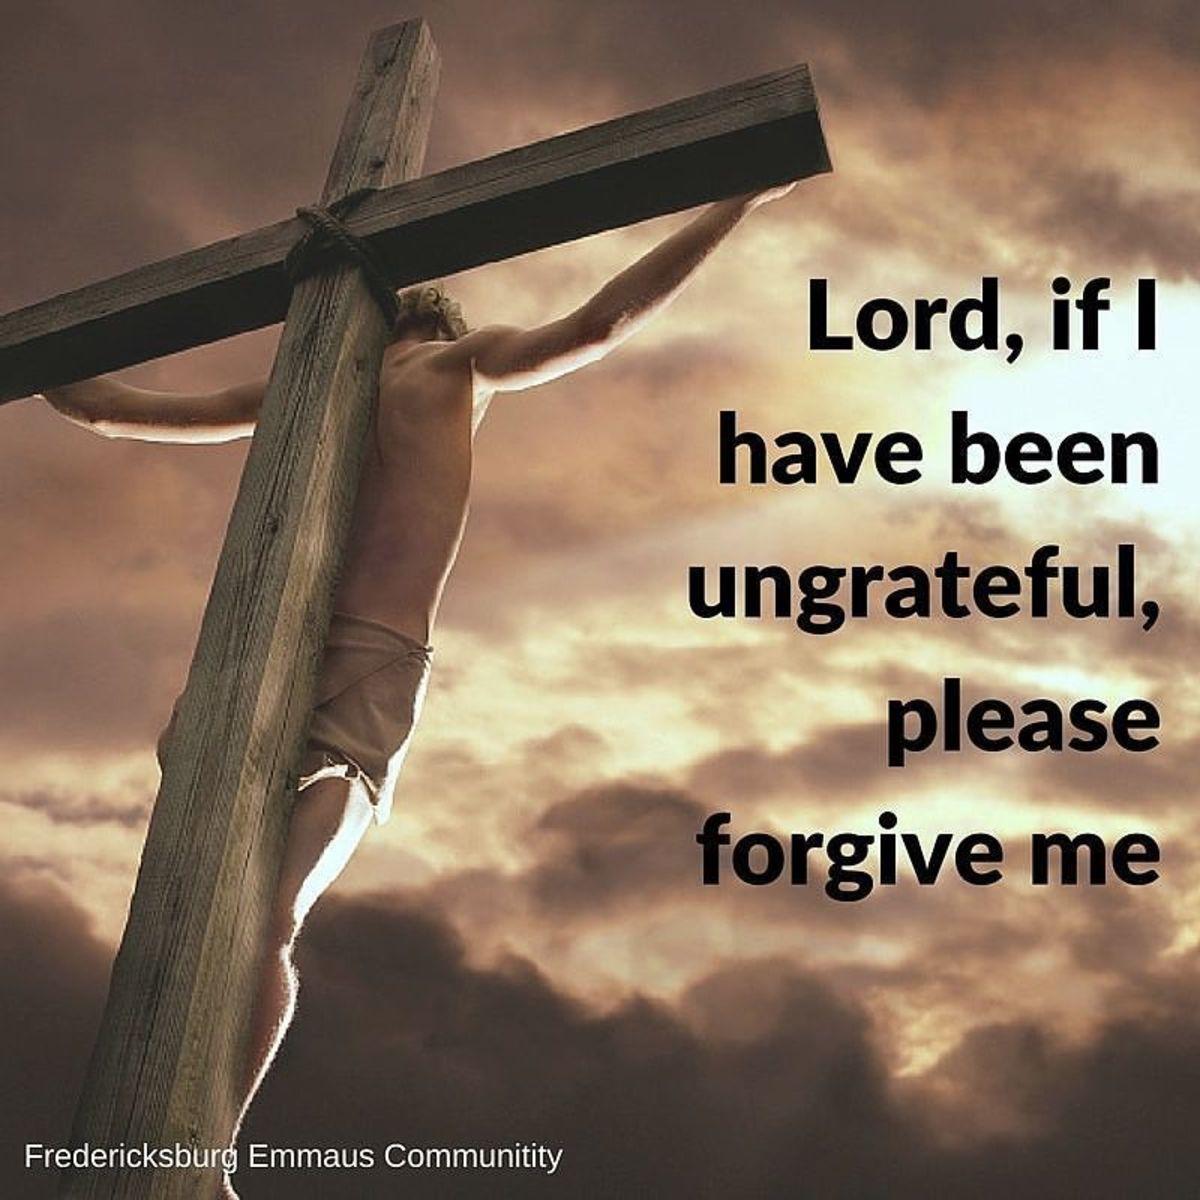 Will God forgive us of repetative sins?